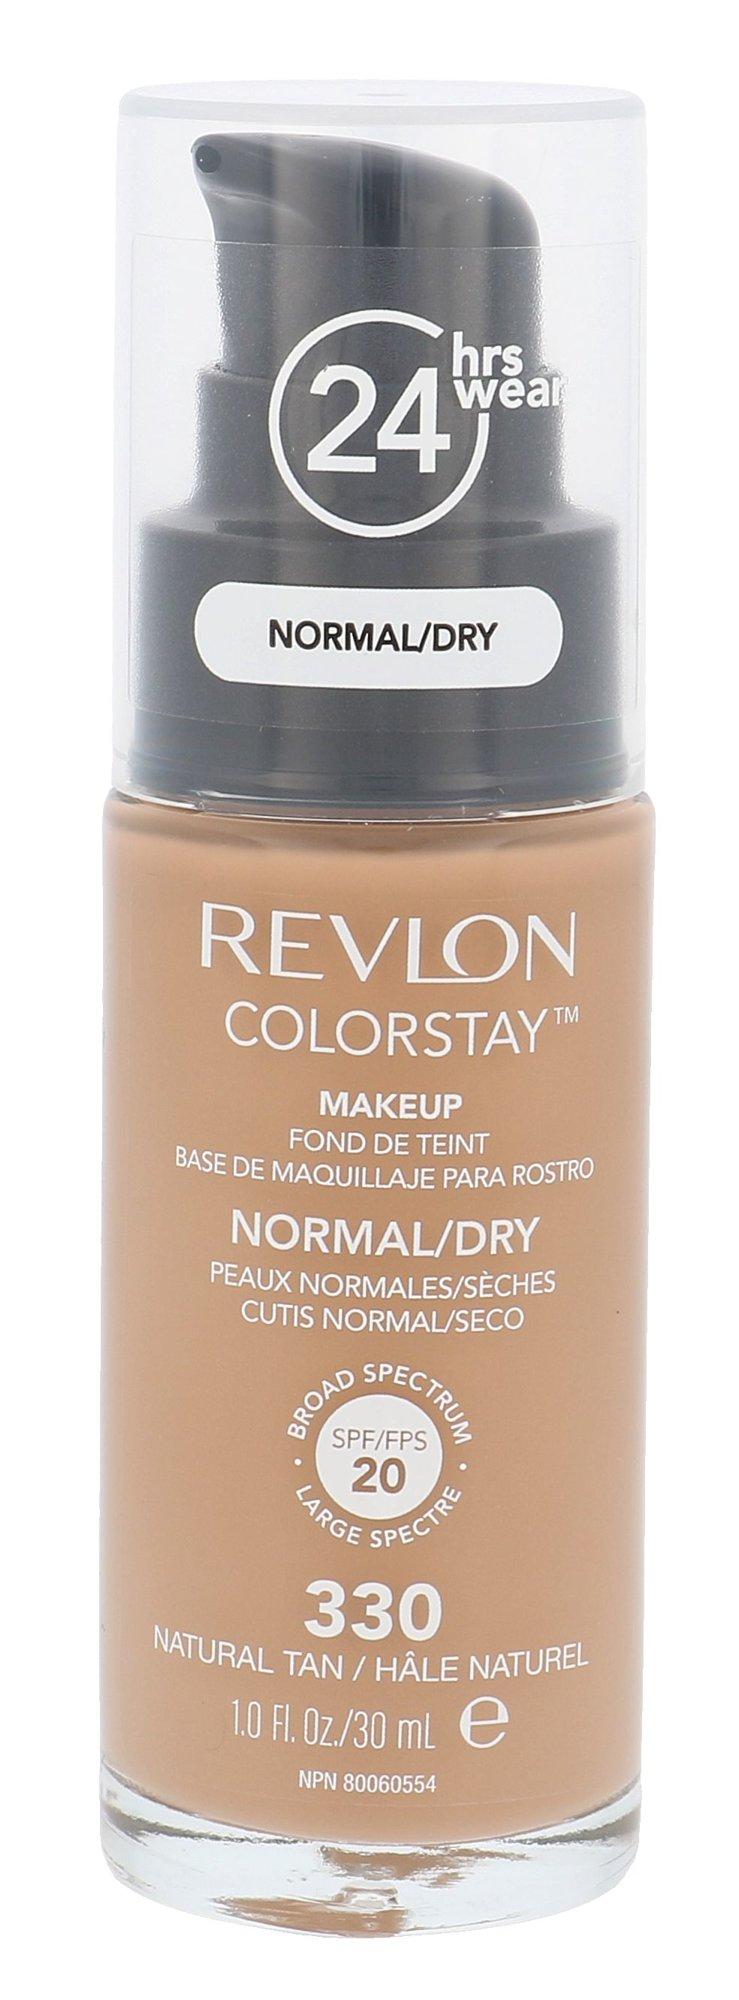 Revlon Colorstay Cosmetic 30ml 330 Natural Tan